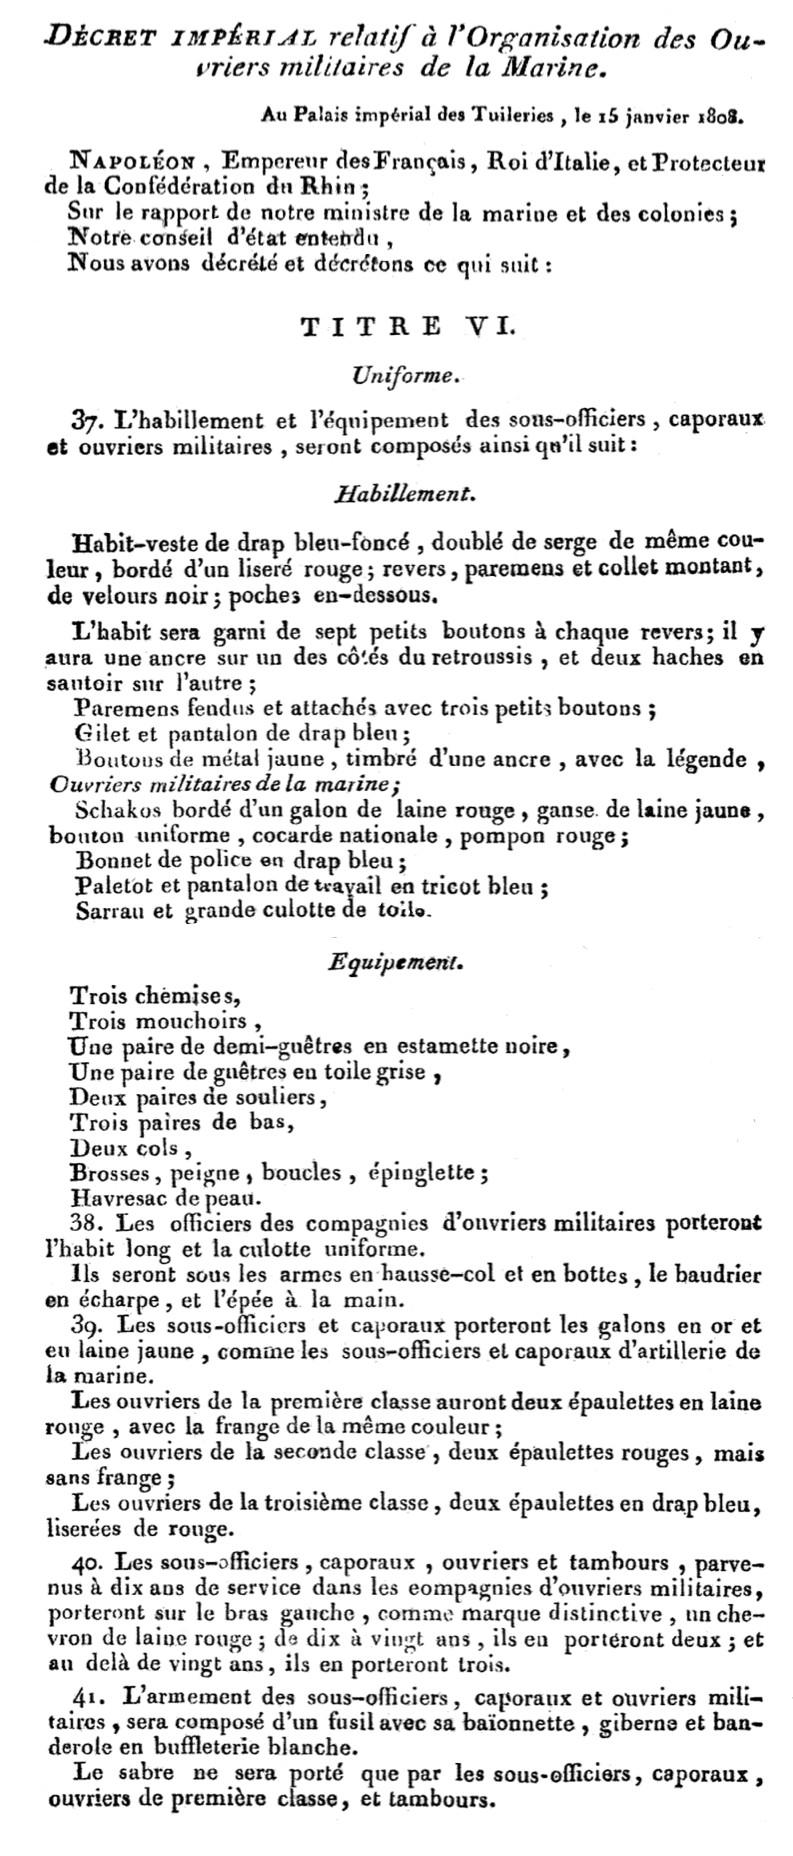 Vitrine Alain 2 Légion Irlandaise Carabinier 1808 SOGA Miniatures 54 mm ) - Page 8 18090307475110262915876082